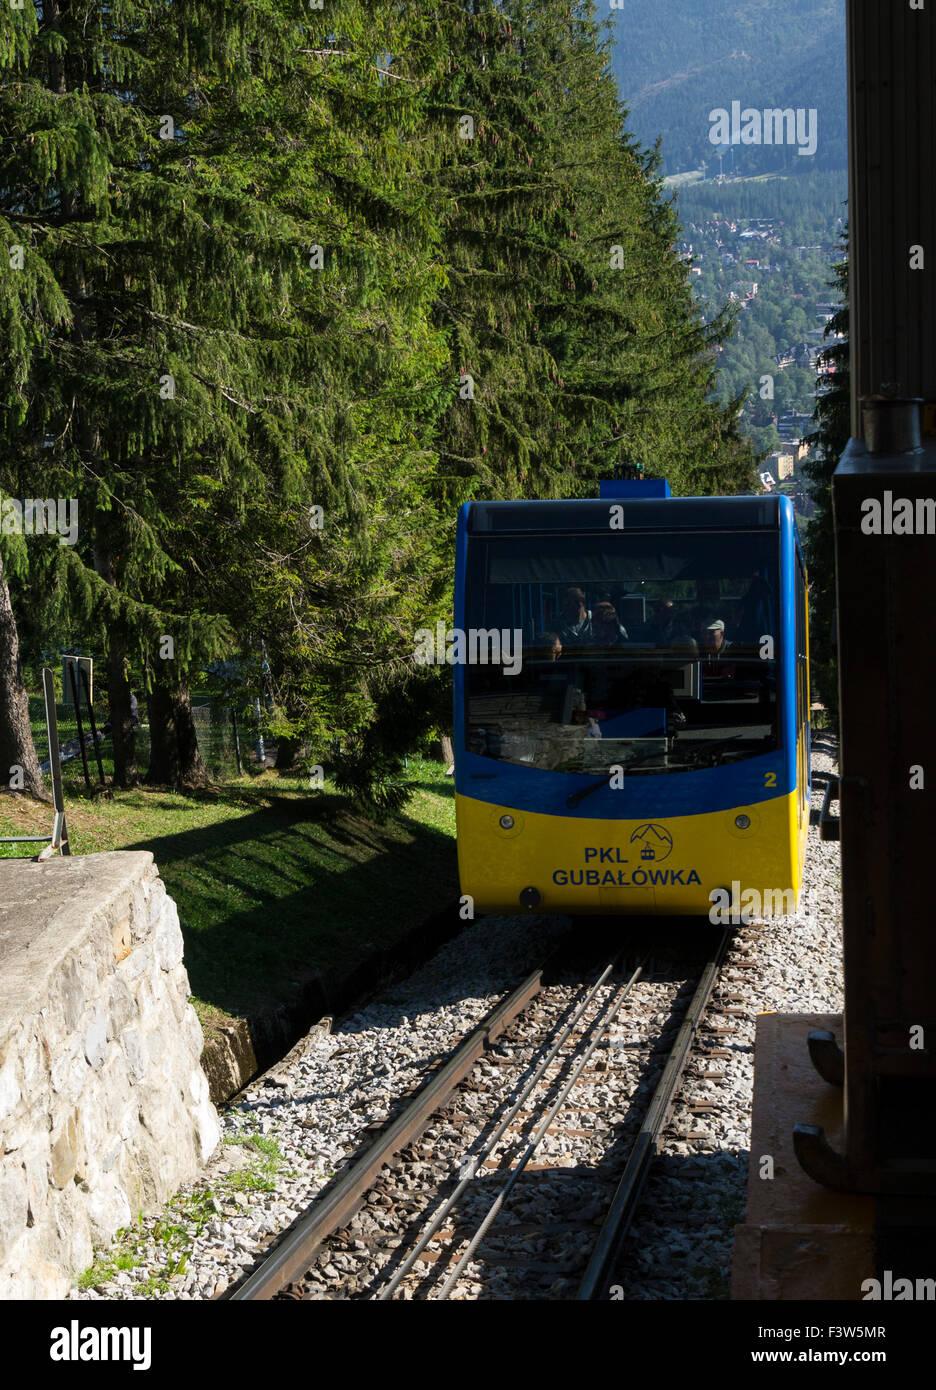 Funicular railway carriage arriving top station Gubalowka Hill Zakopane Poland popular tourist destination with - Stock Image